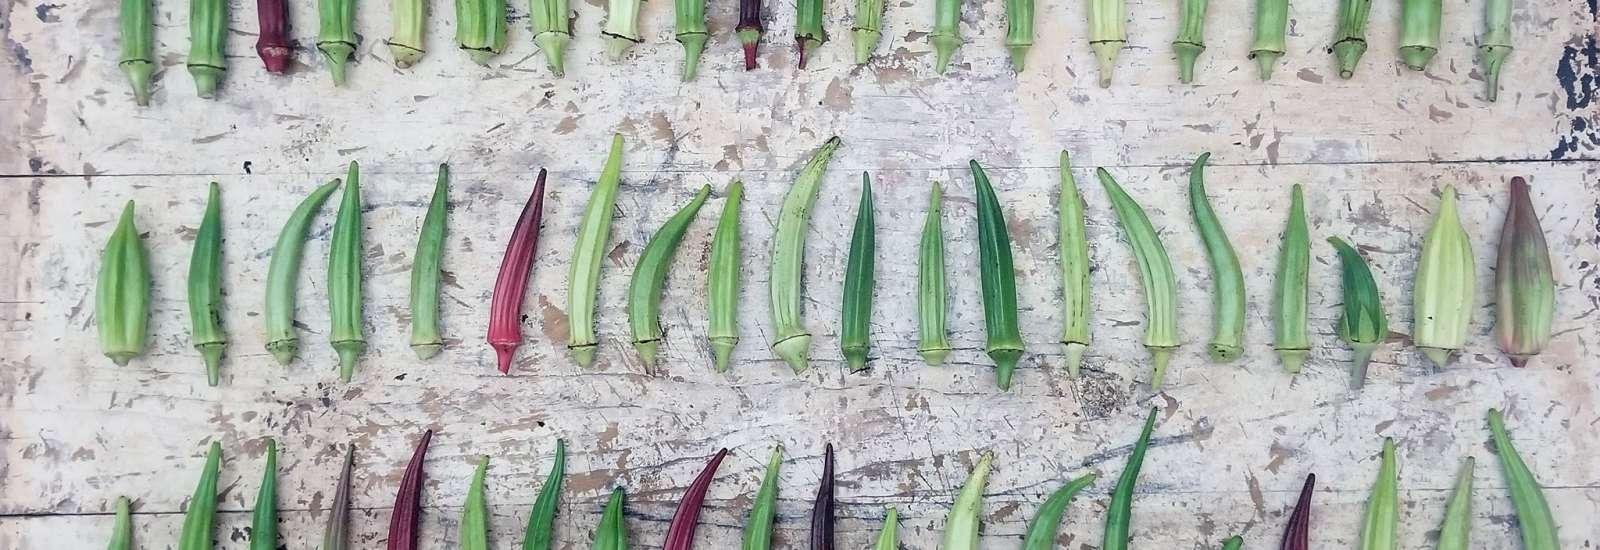 A variety of okra